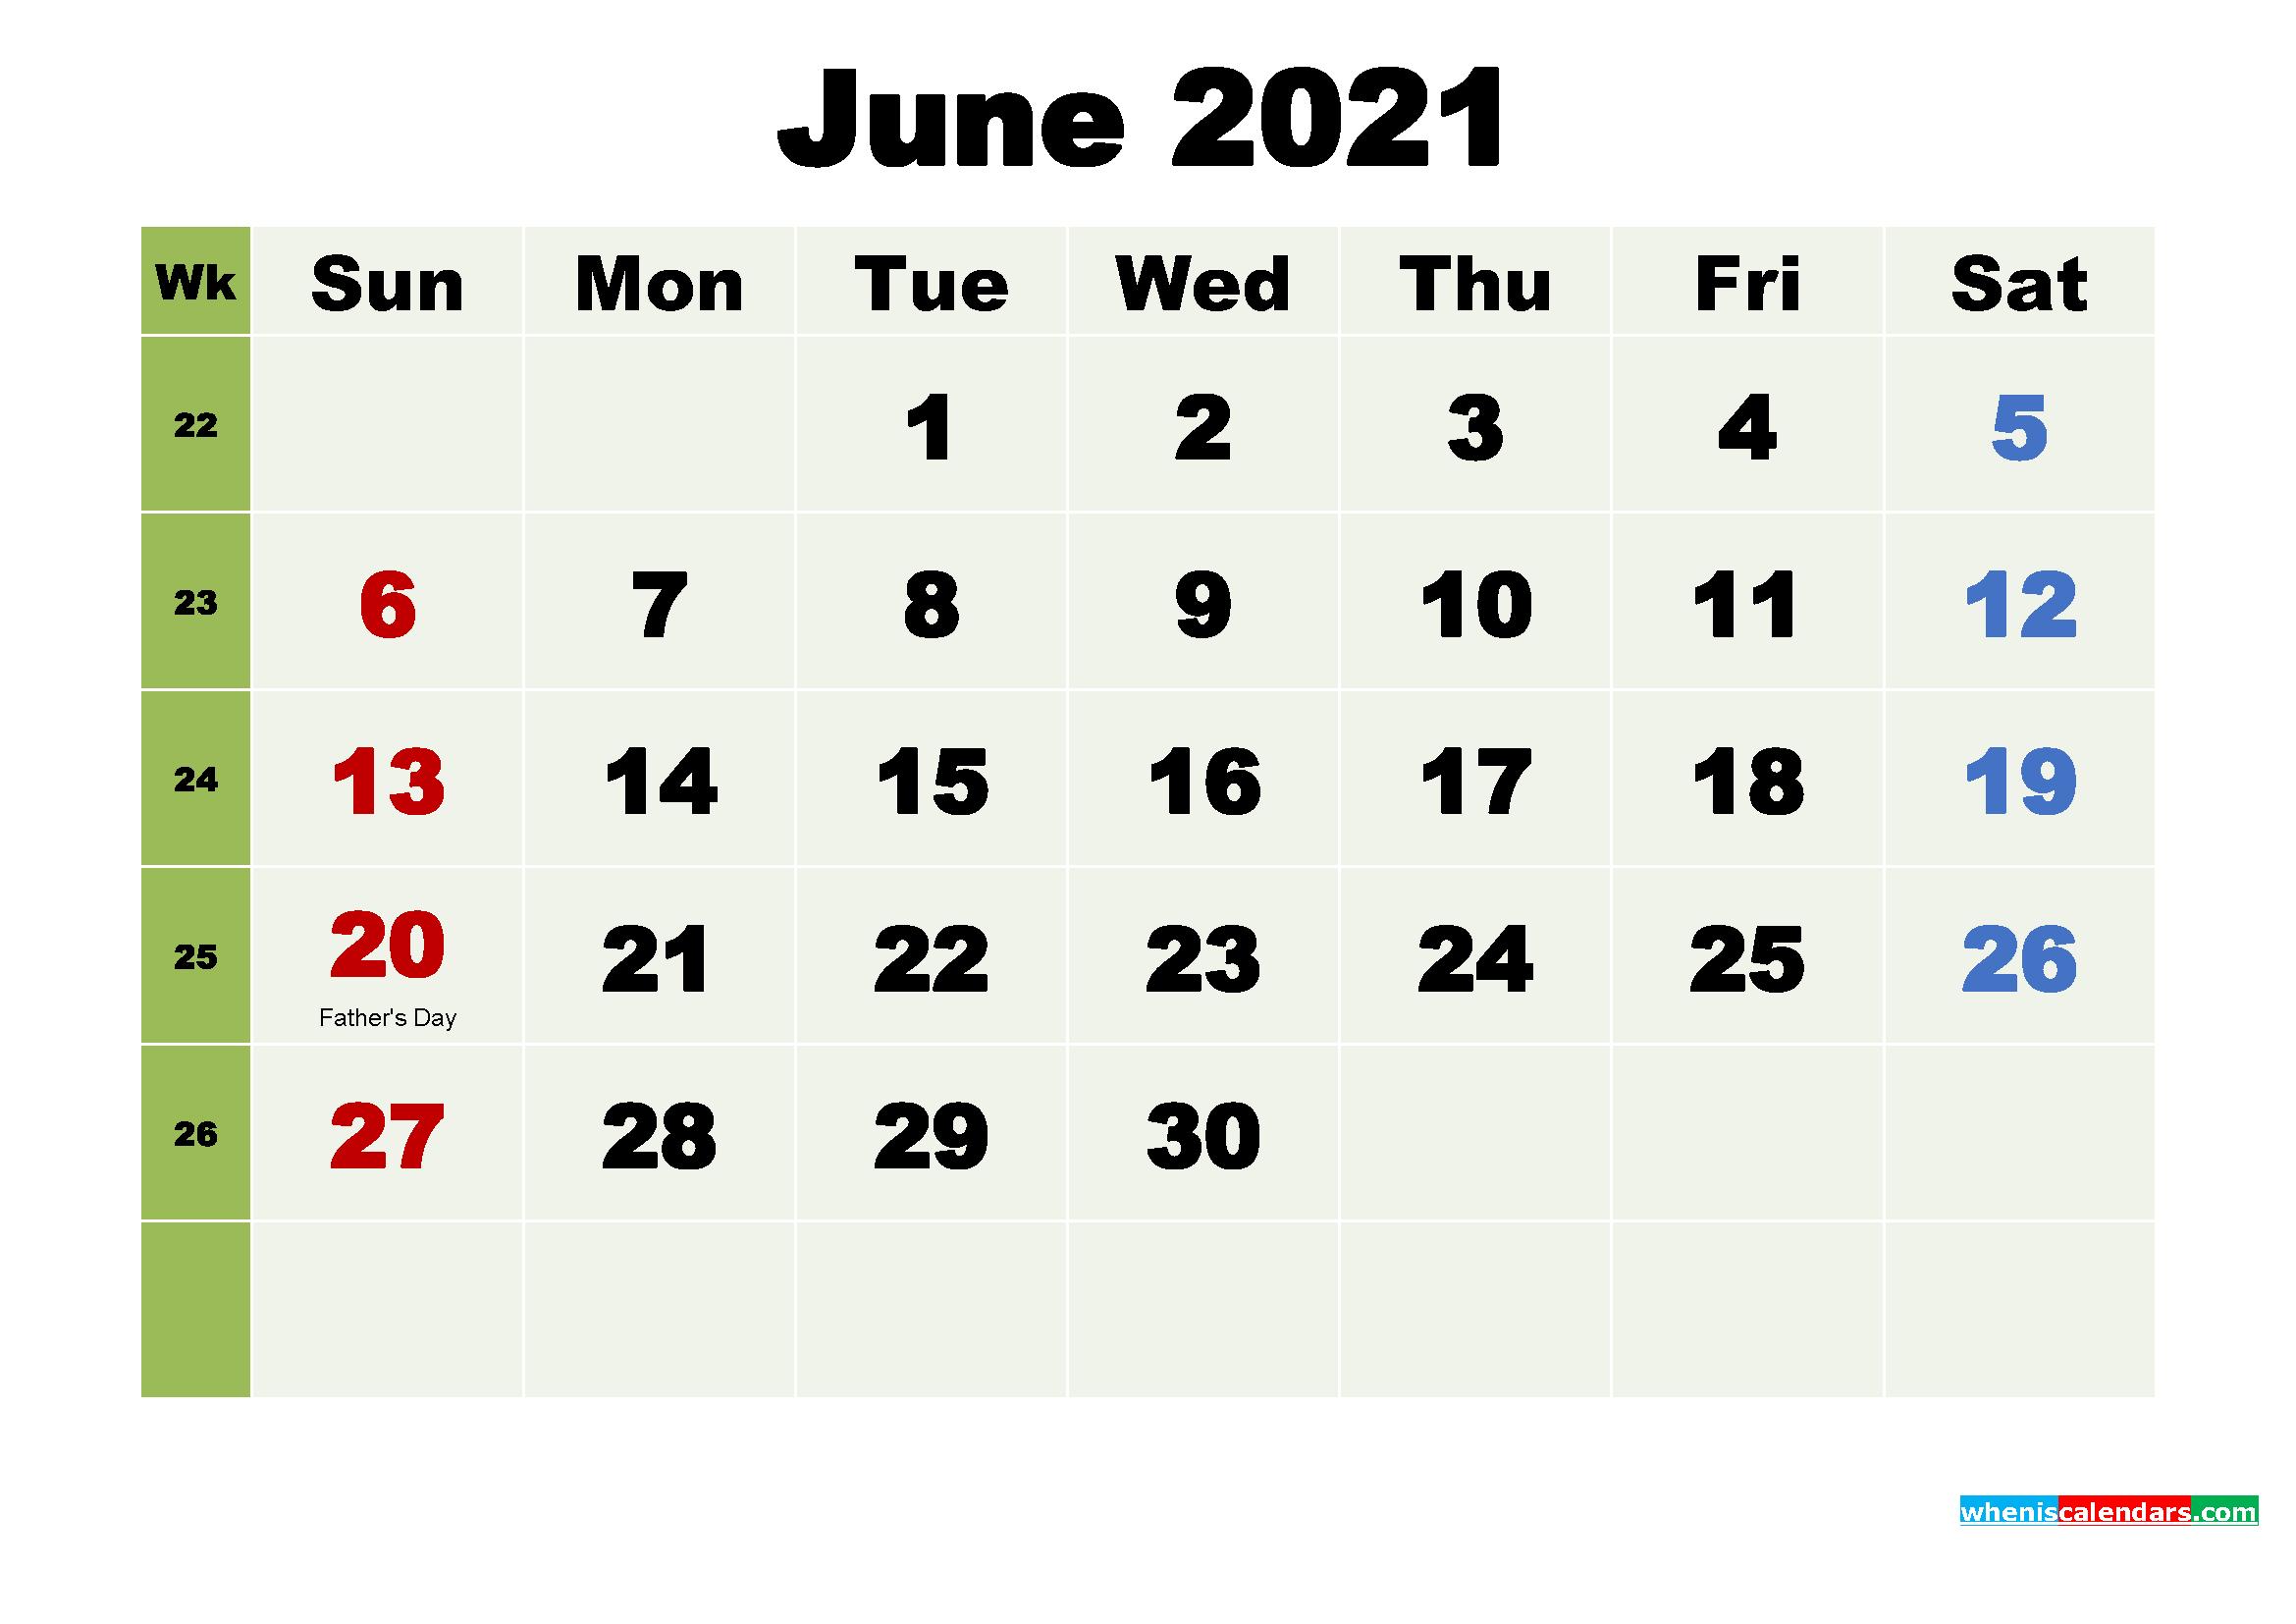 Printable Calendar June 2021 with Holidays as Word, PDF